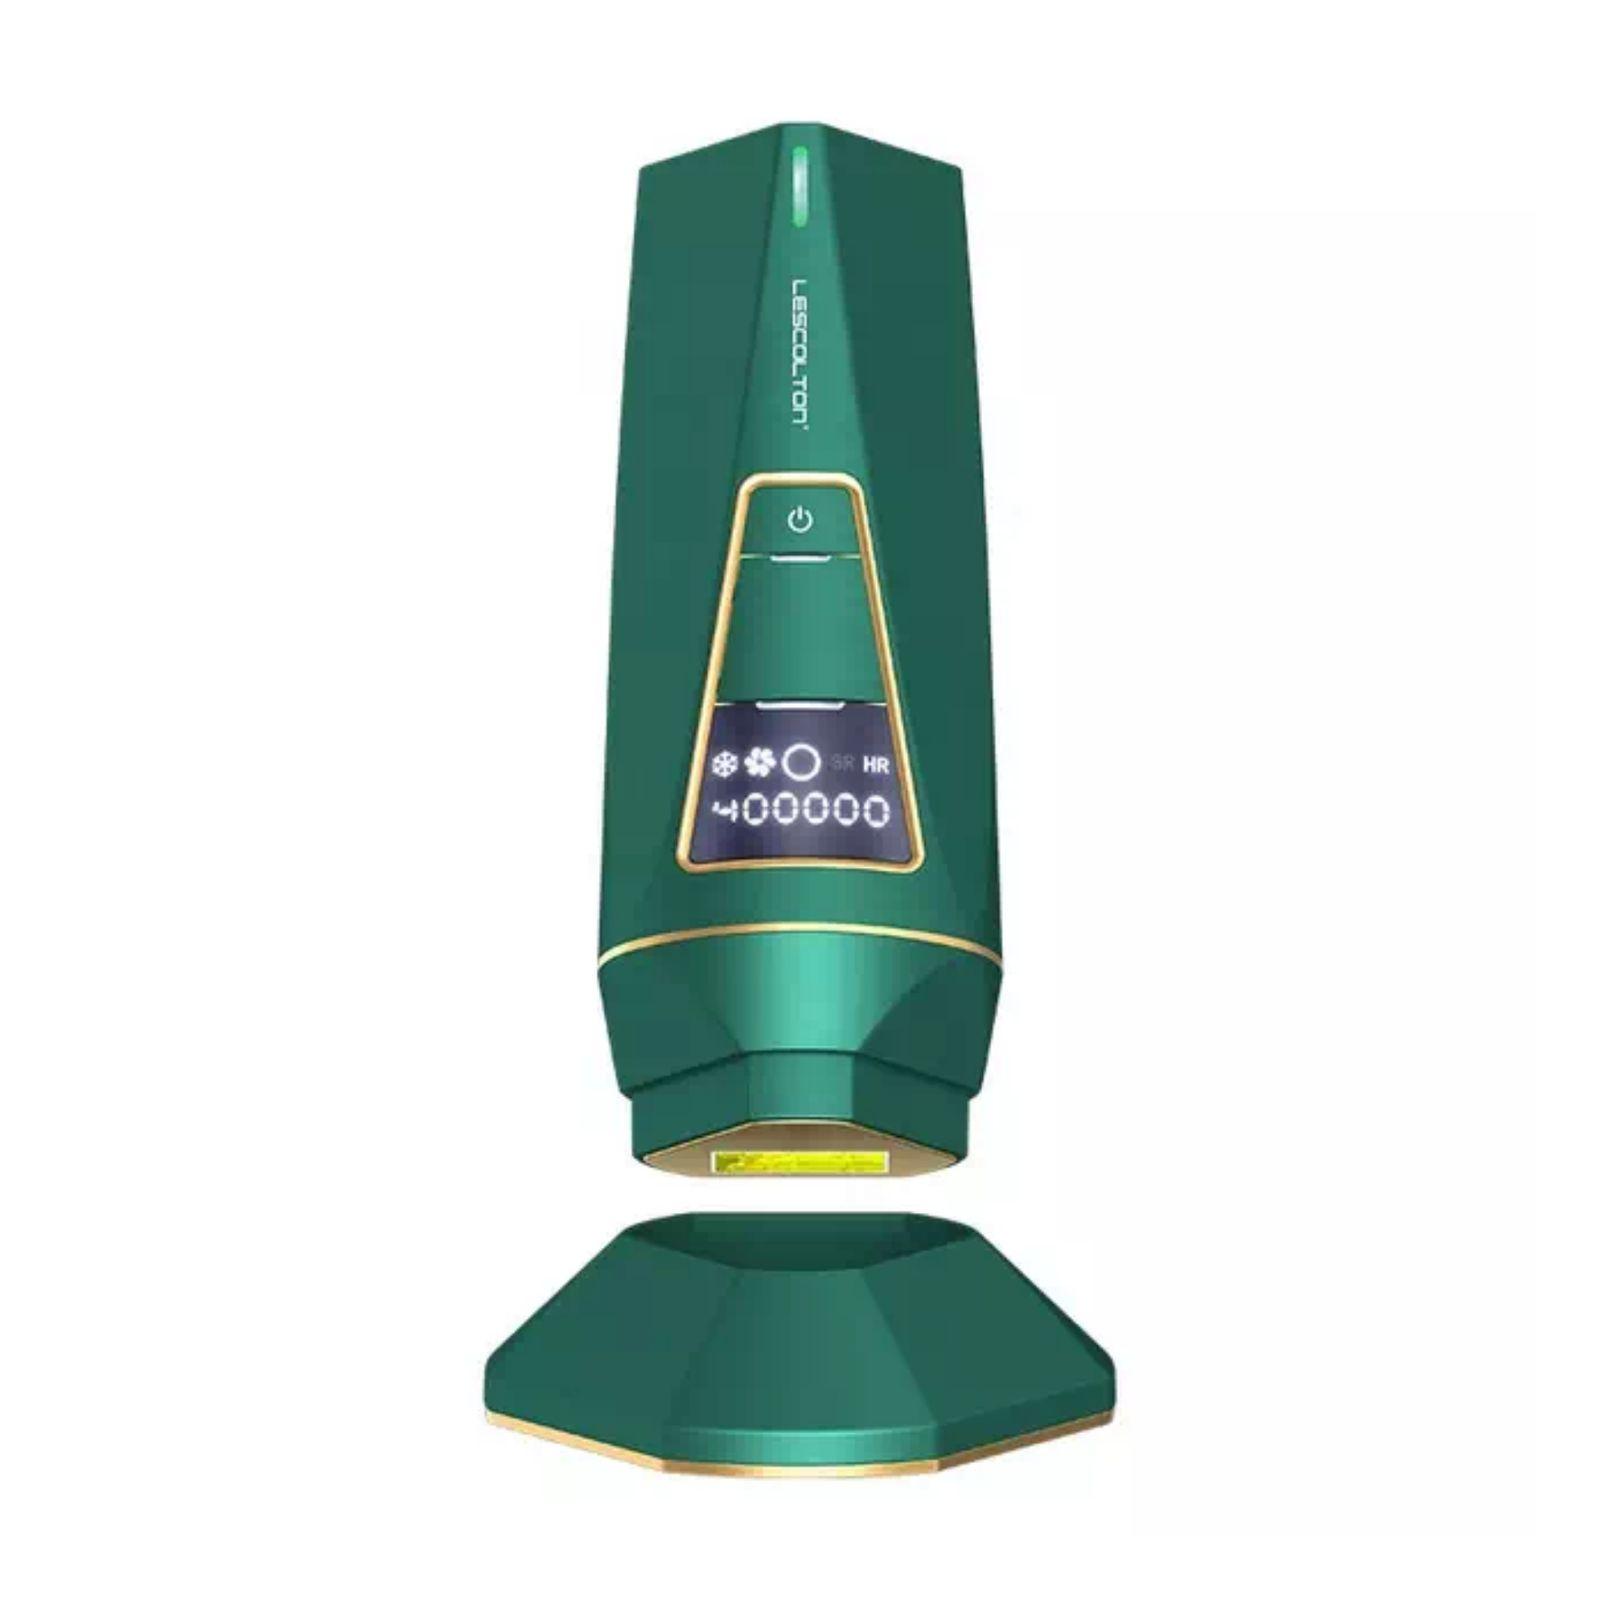 لیزر بدن لسکلتون مدل T015C -  - 3